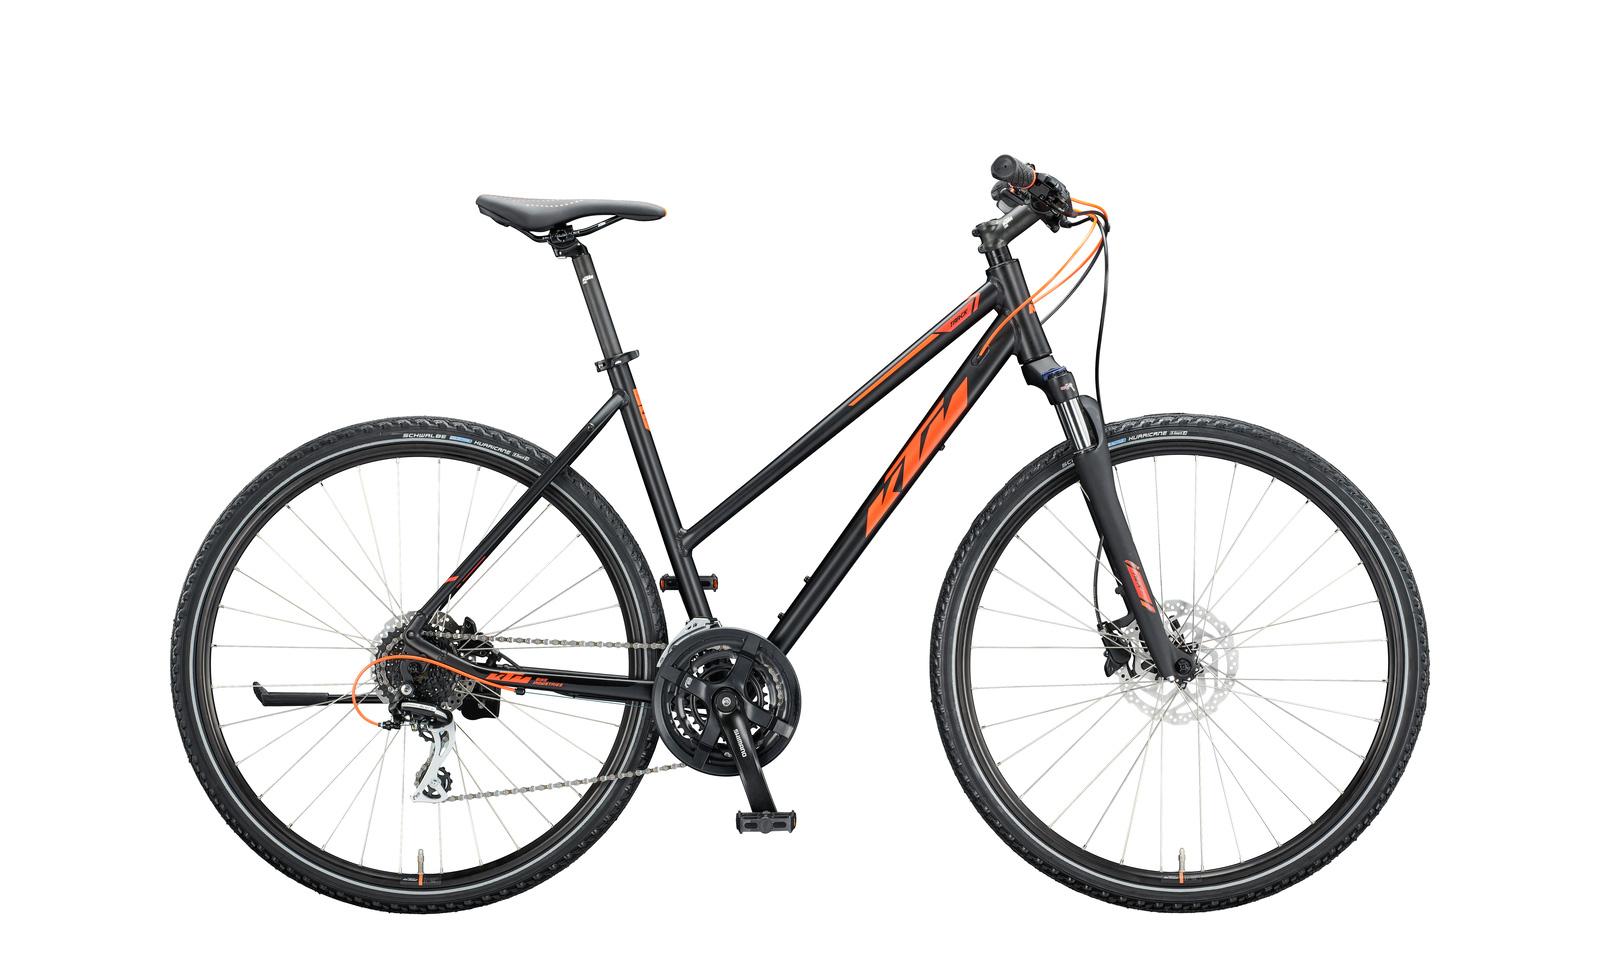 Biciclete KTM Trekking Offroad LIFE TRACK 3x8 Shimano Acera